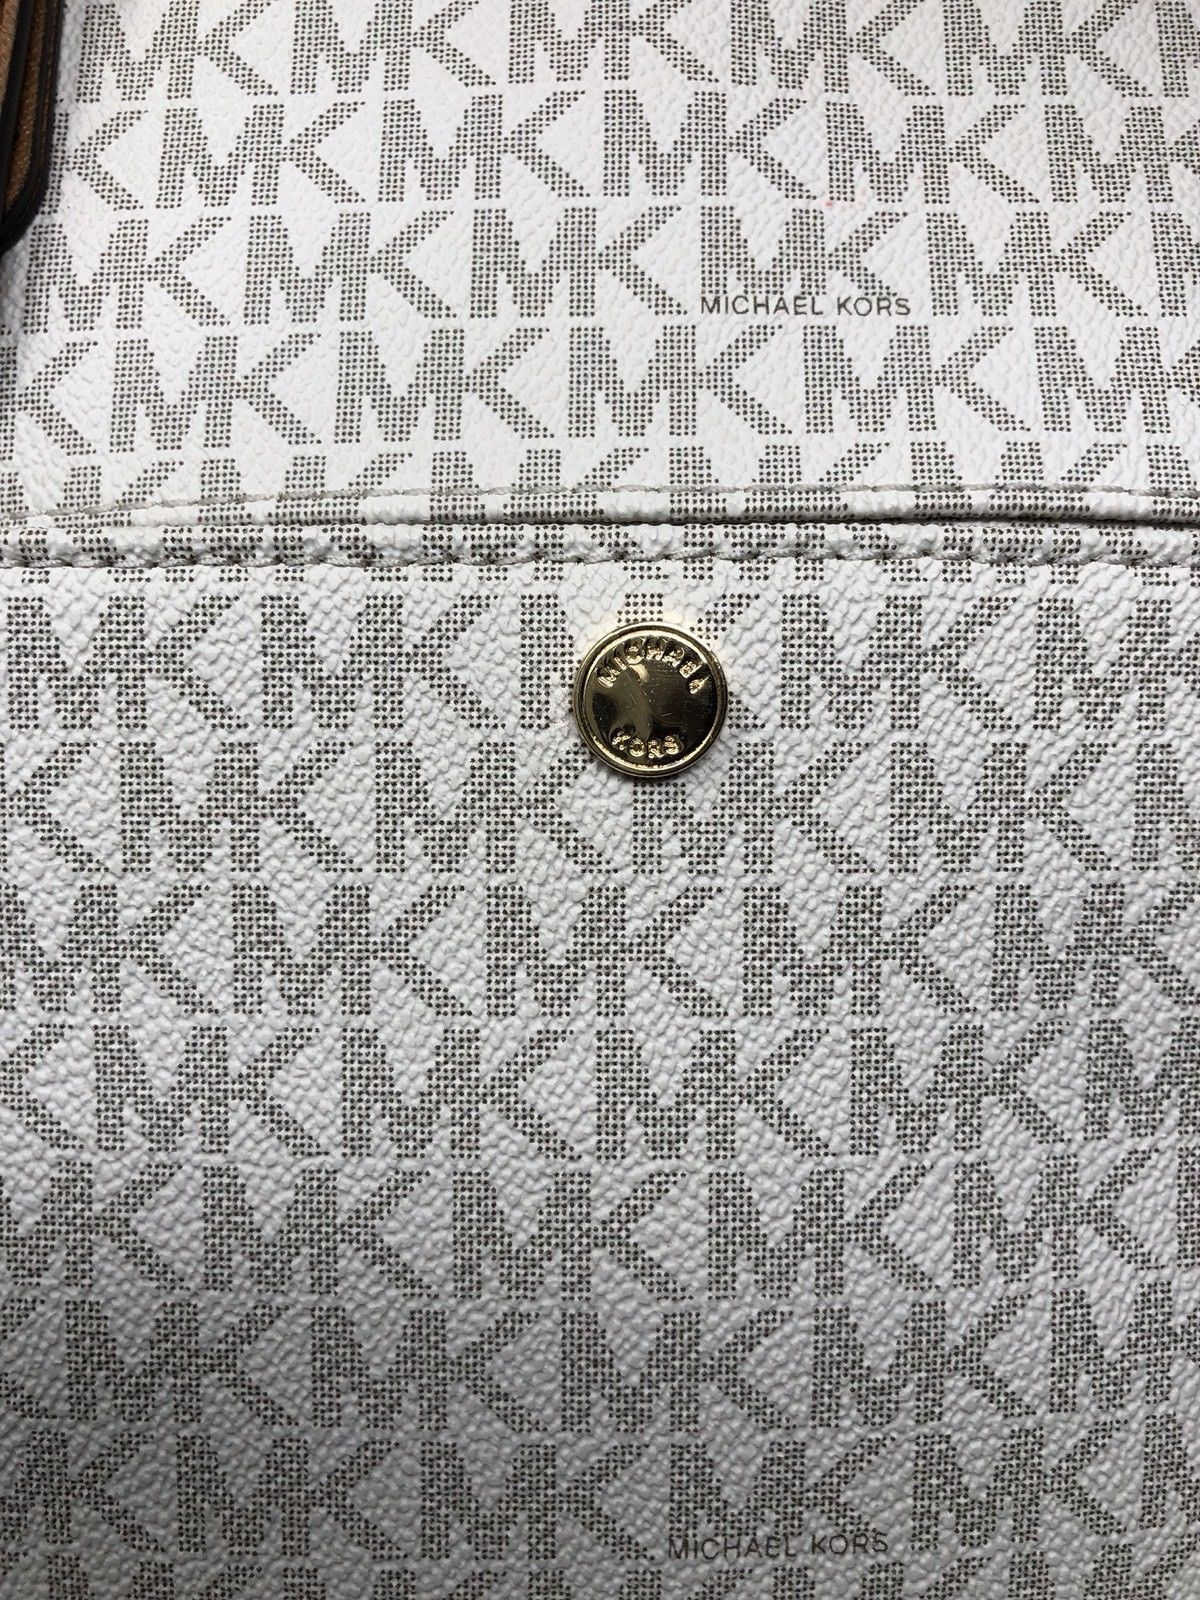 a031004b3f58f8 New Michael Kors Vanilla Gold Signature Jet Set Item MD Snap Pocket Tote  Purse